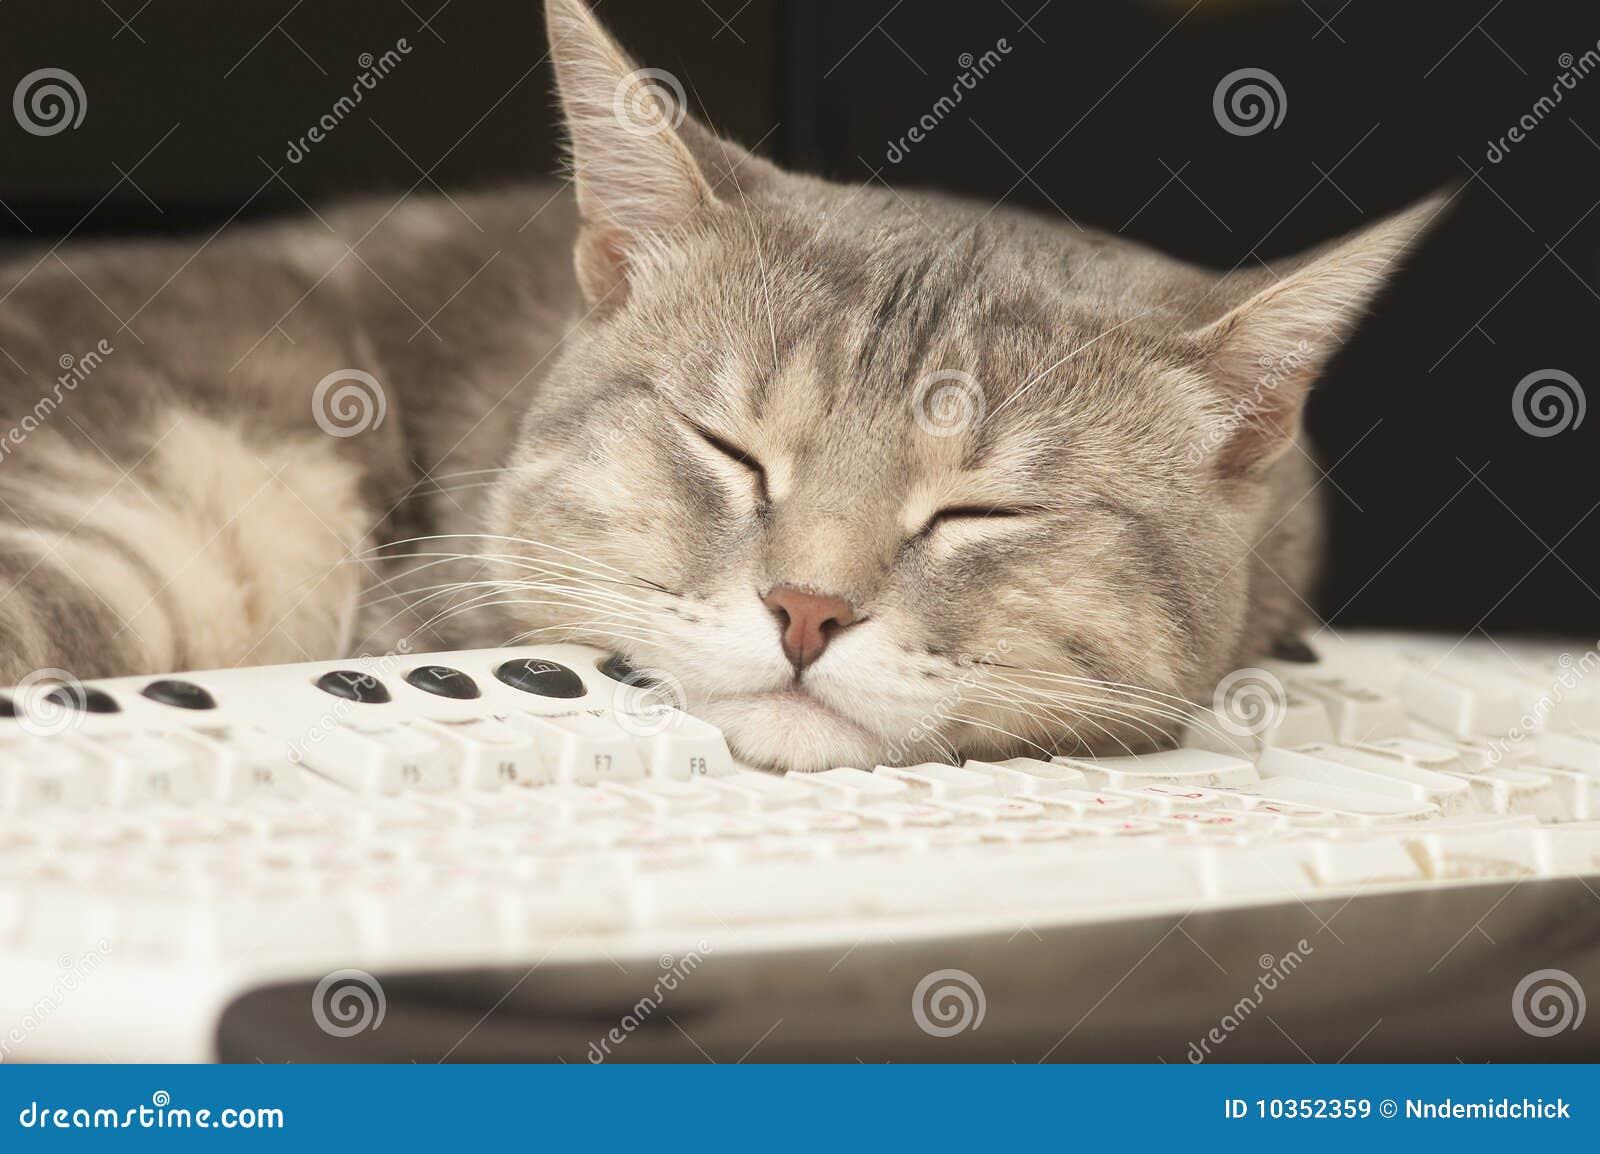 Cat Sleeping On Keyboard Royalty Free Stock Images - Image ...